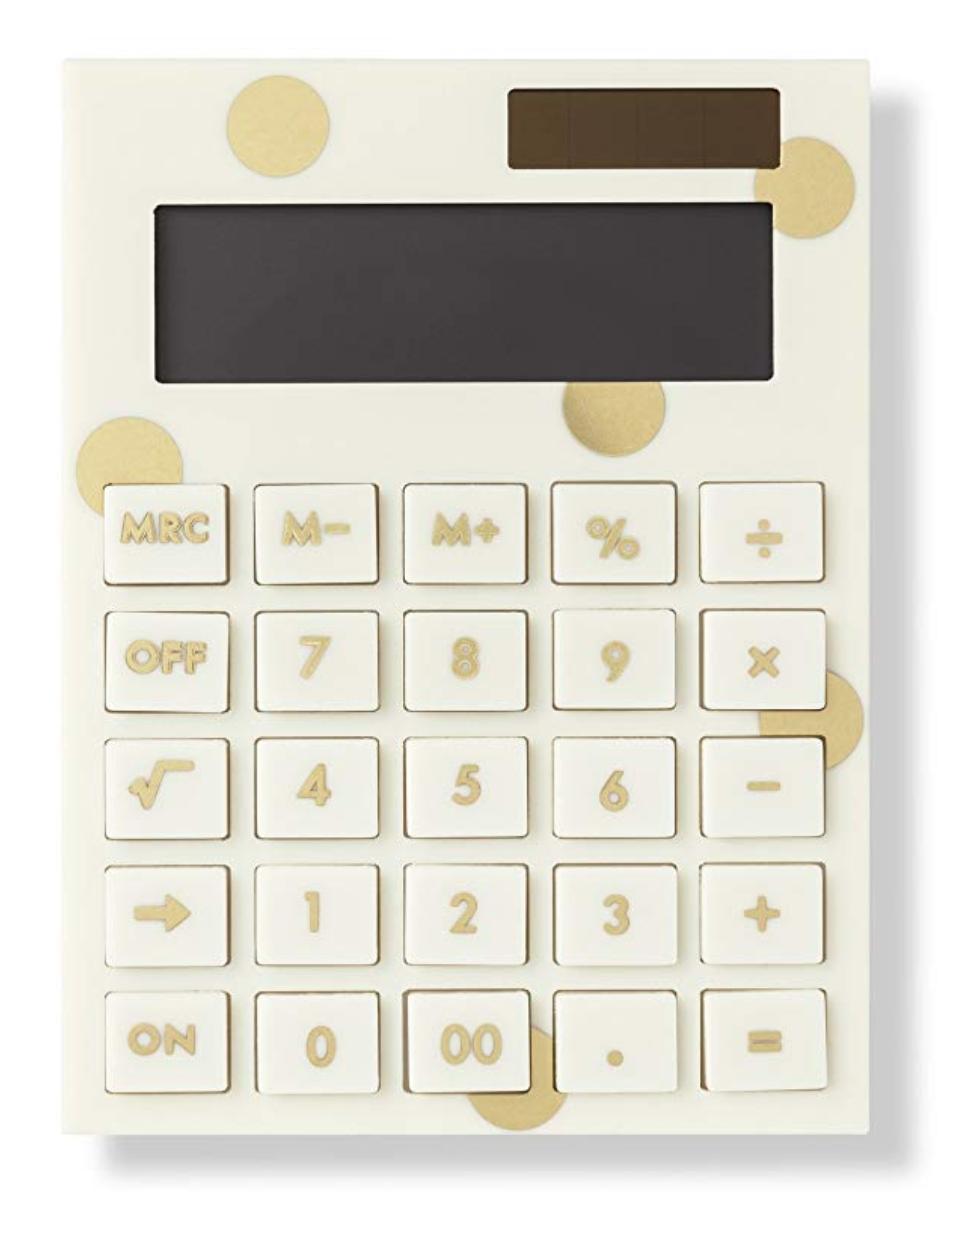 Quirky Calculator